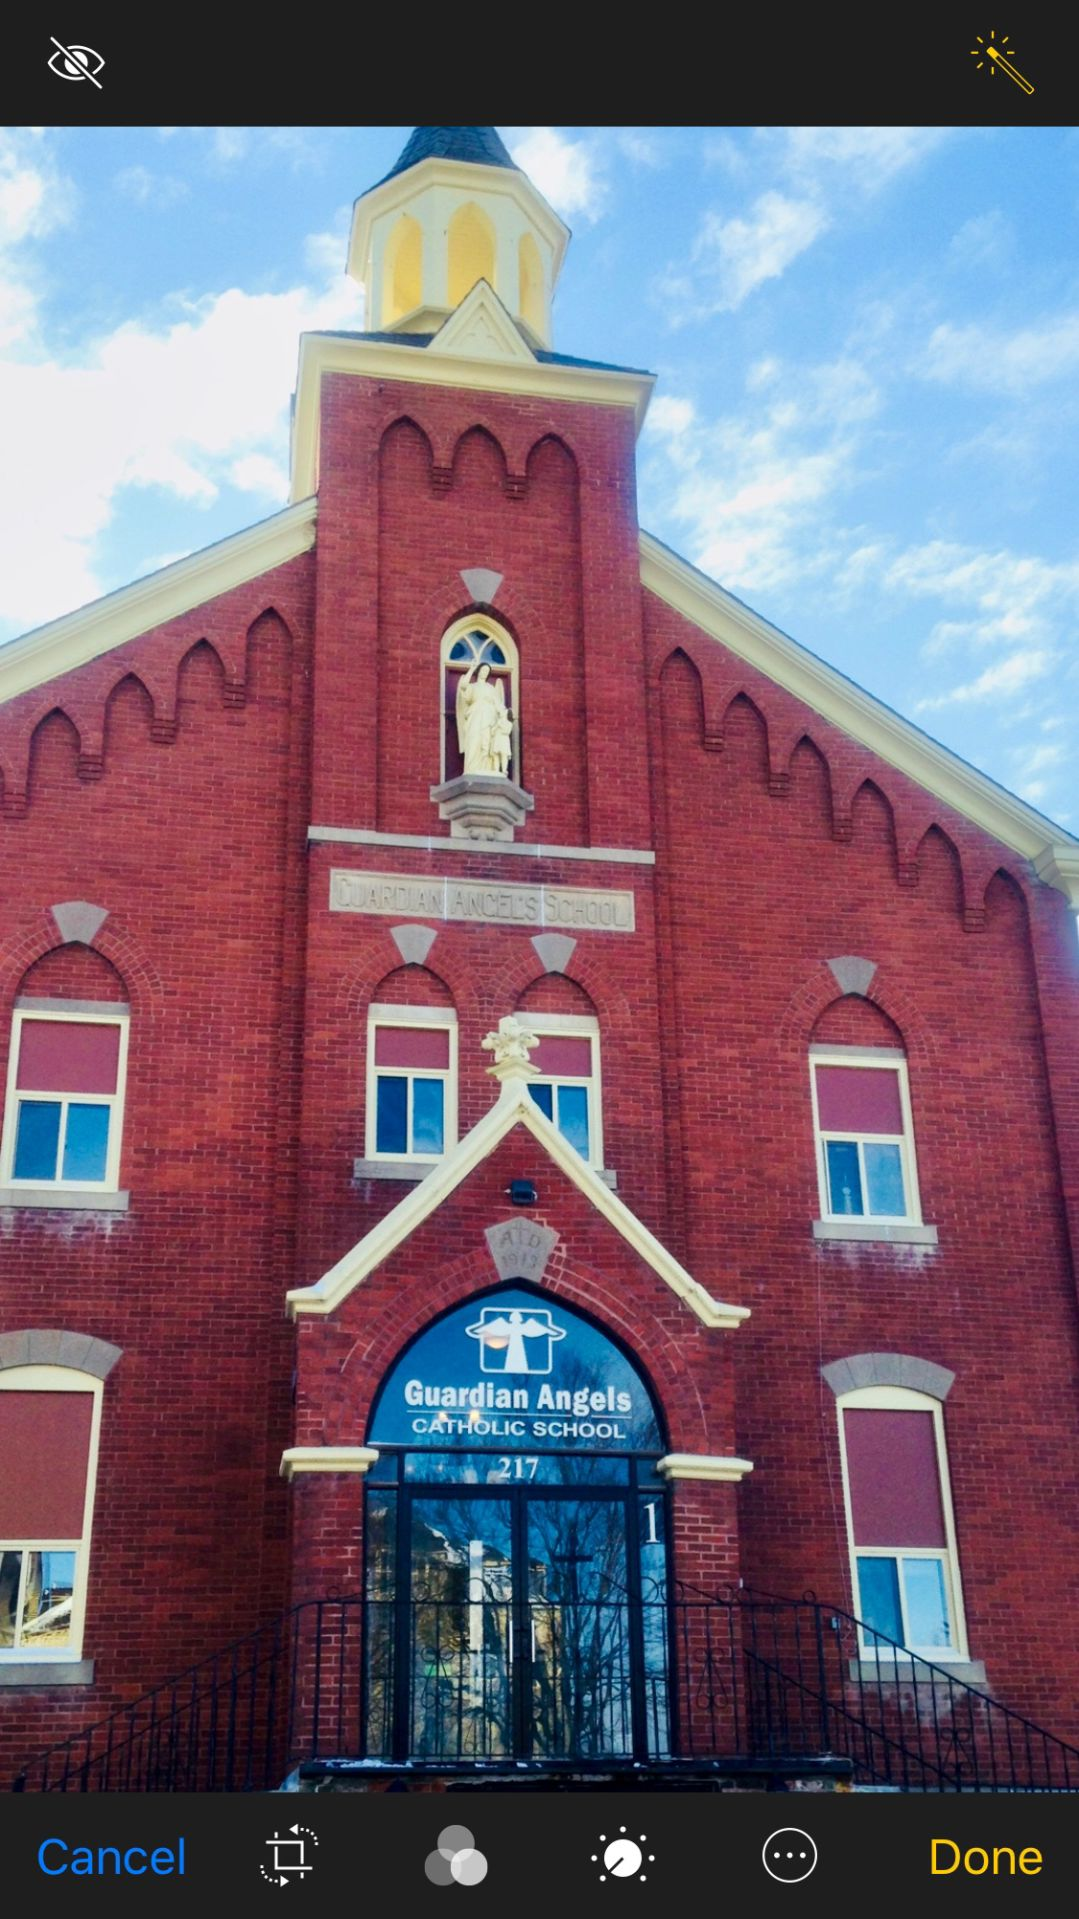 Guardian Angels Catholic School - School